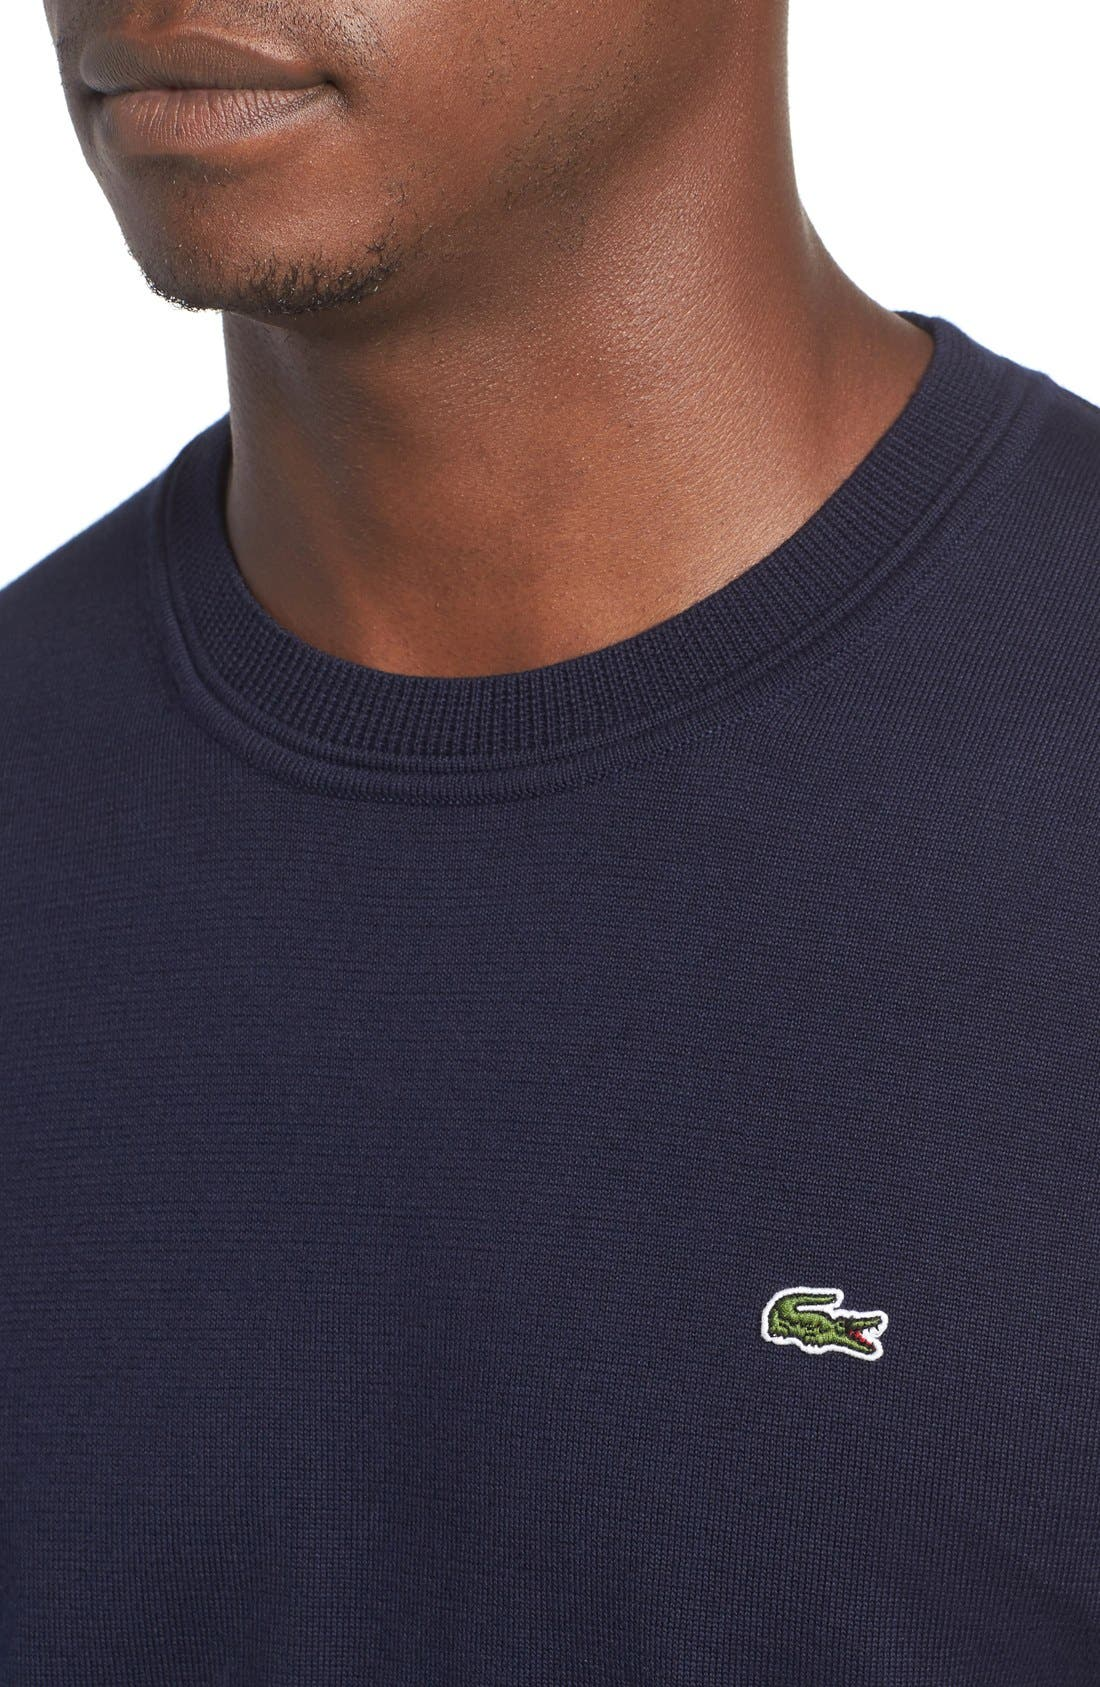 Jersey Knit Crewneck Sweater,                             Alternate thumbnail 4, color,                             Navy Blue